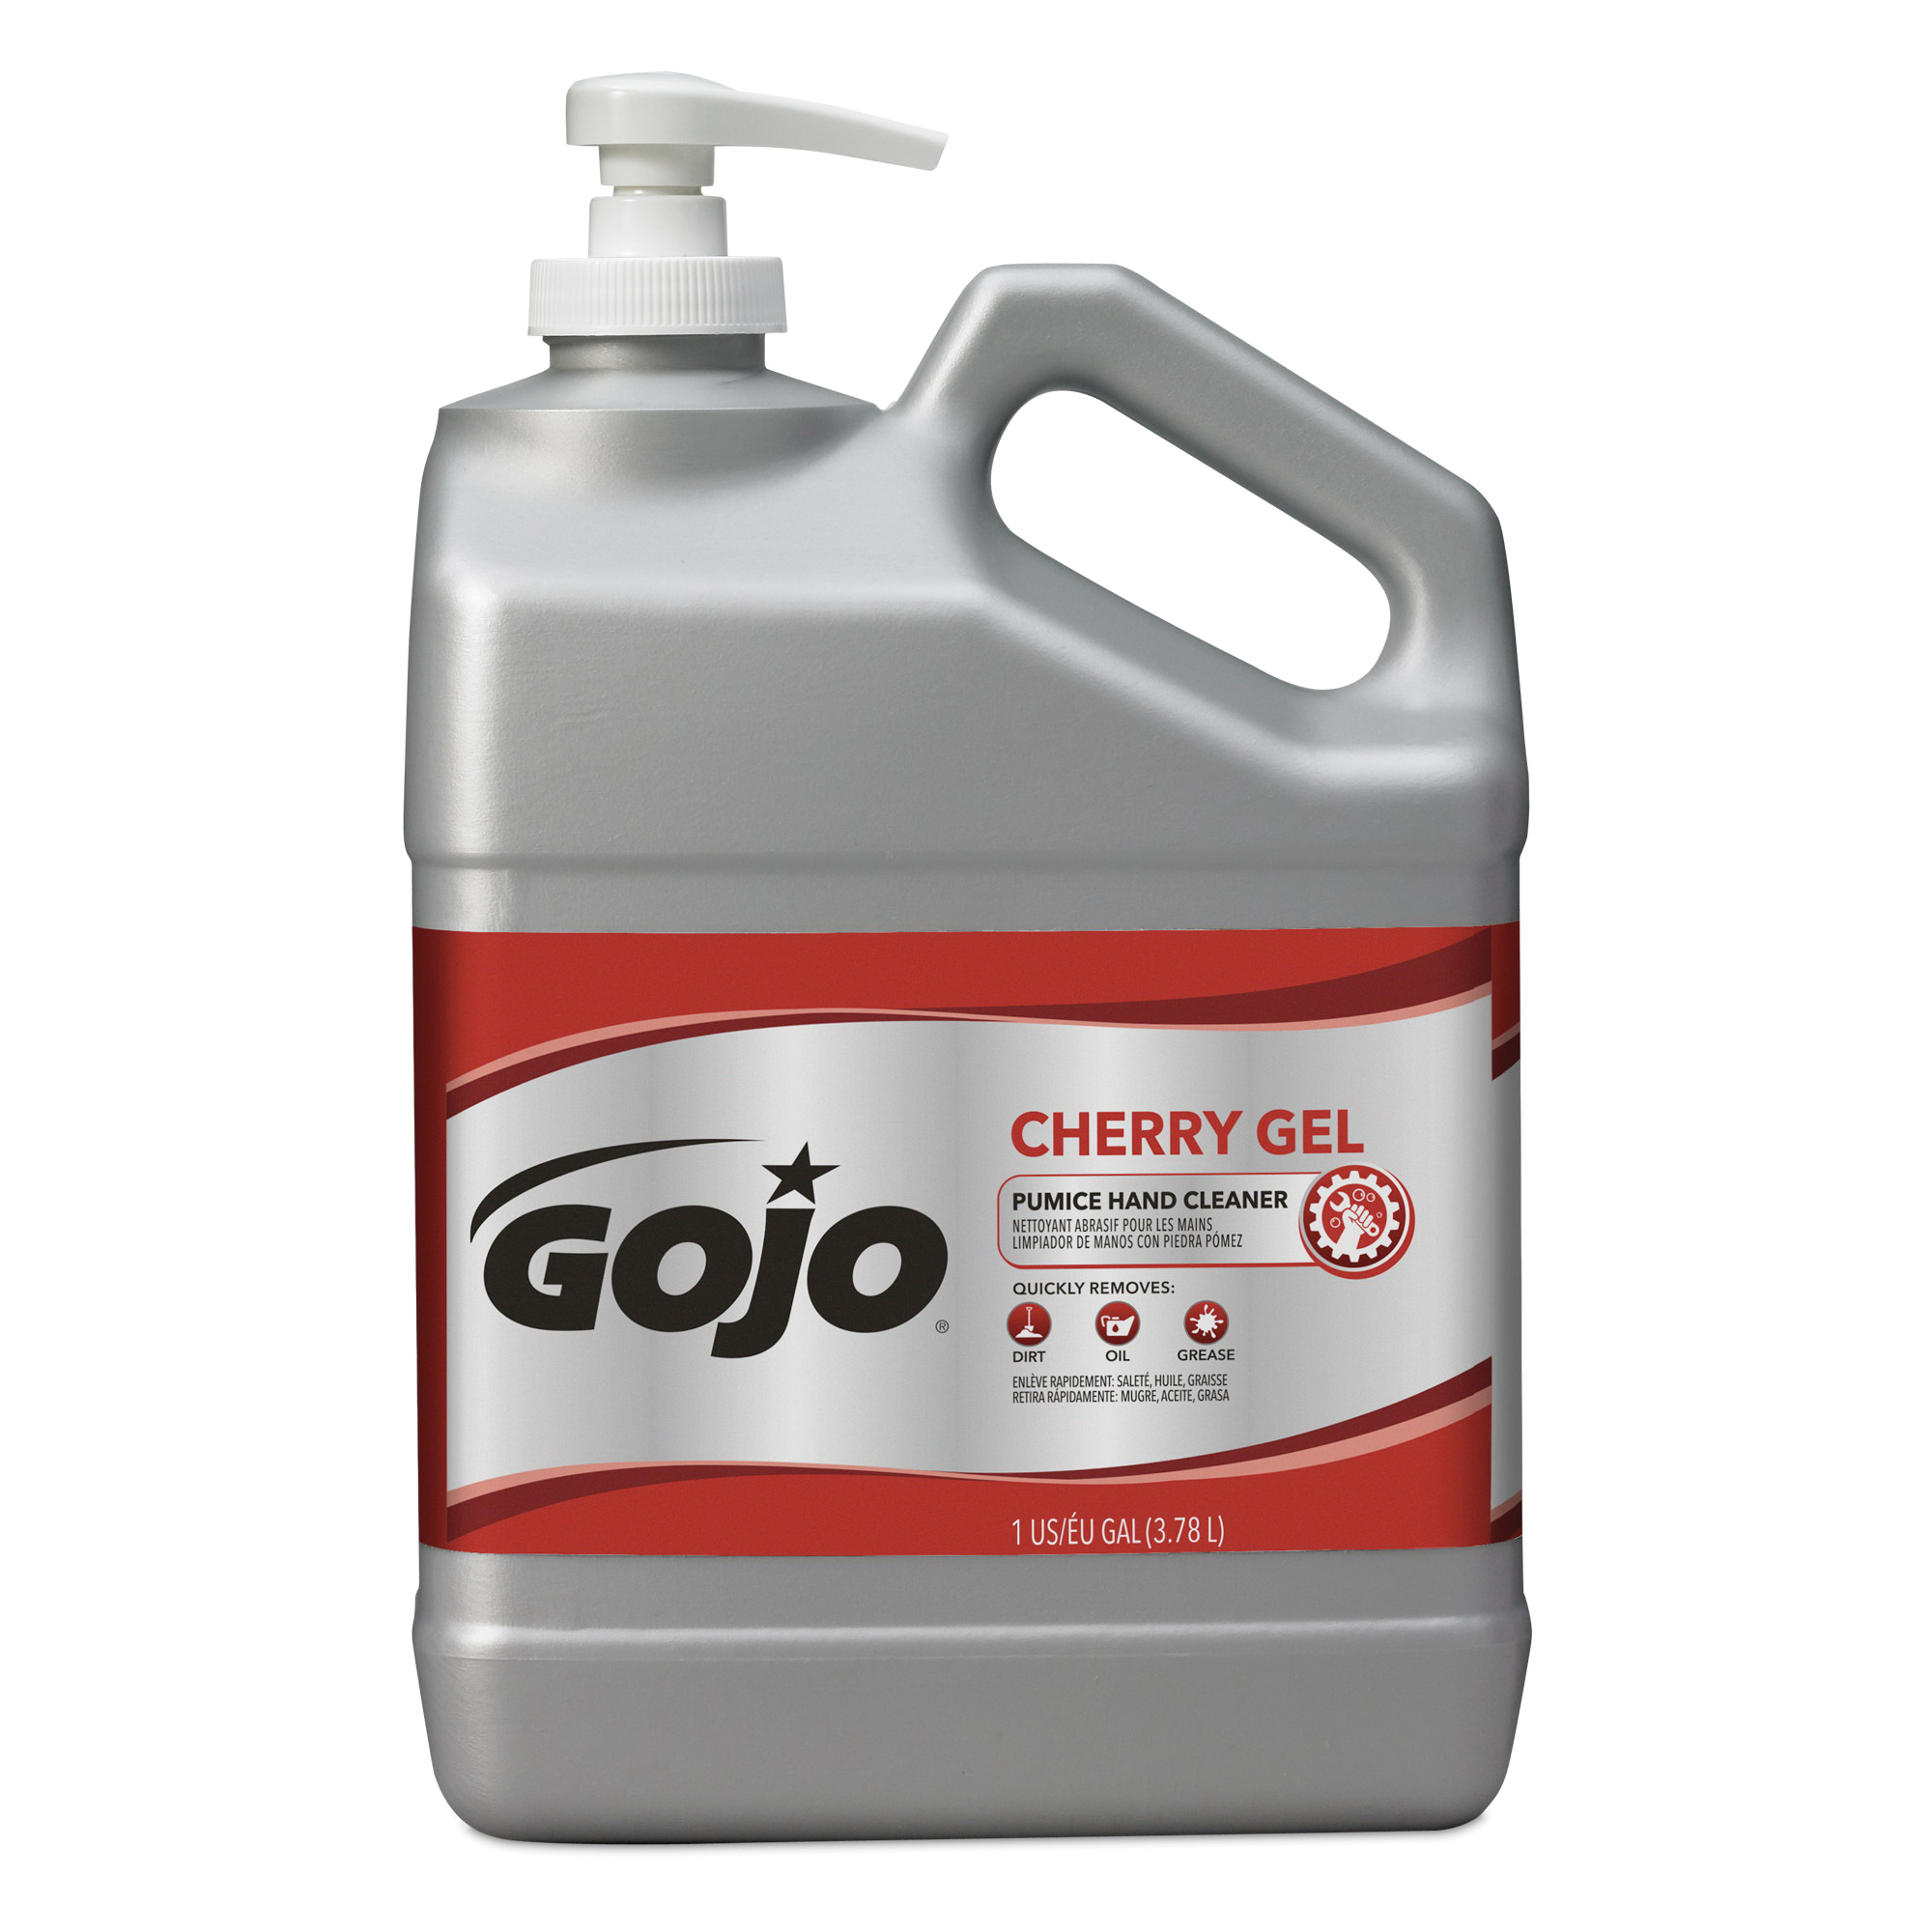 GOJO® 2354-08 Pumice Hand Cleaner, 10 fl-oz Nominal, Bottle Package, Gel Form, Cherry Odor/Scent, Red/Translucent